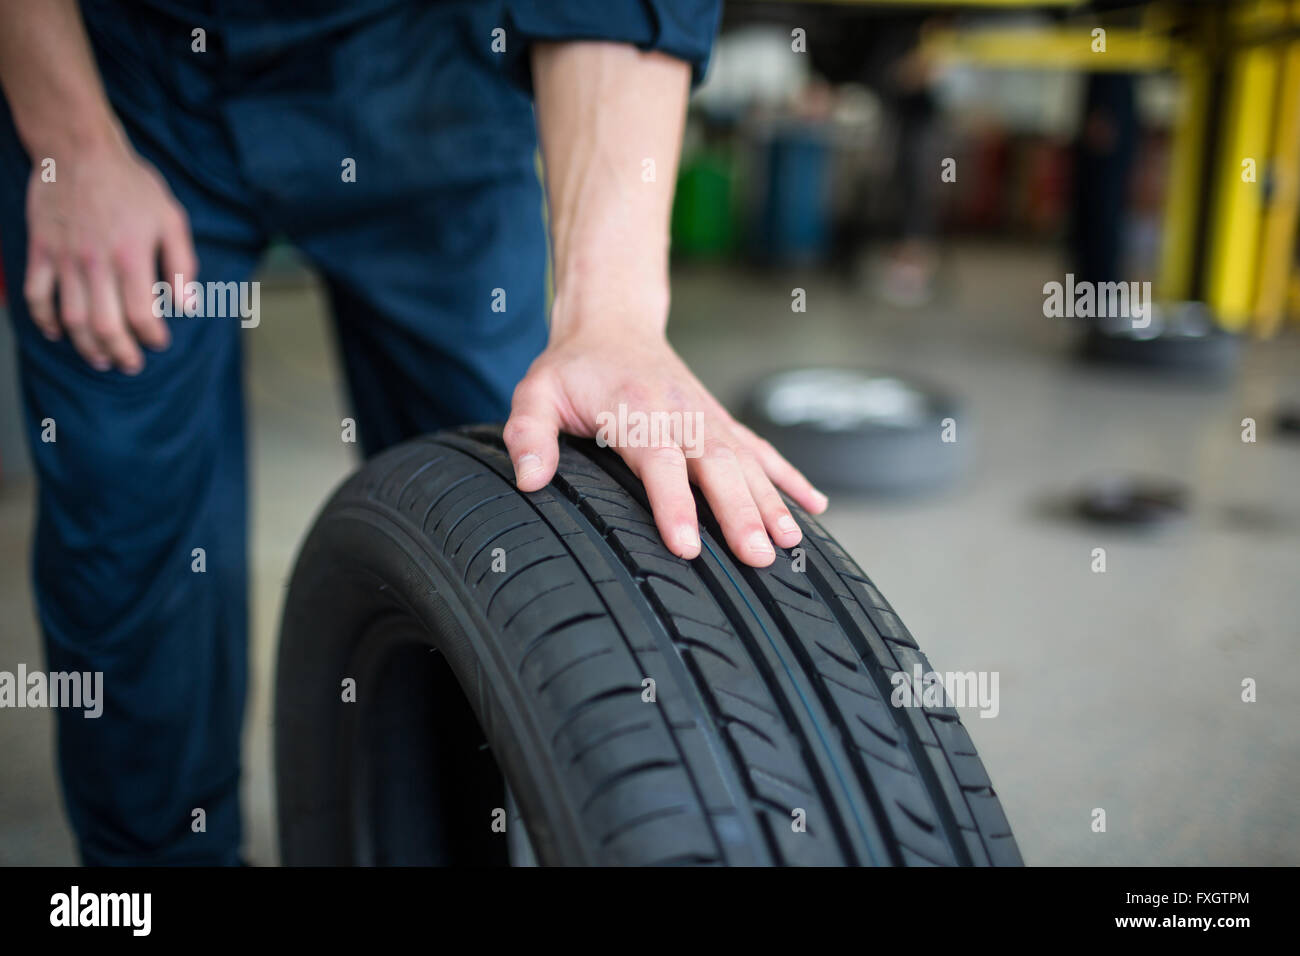 Mechanic pushing a tyre - Stock Image